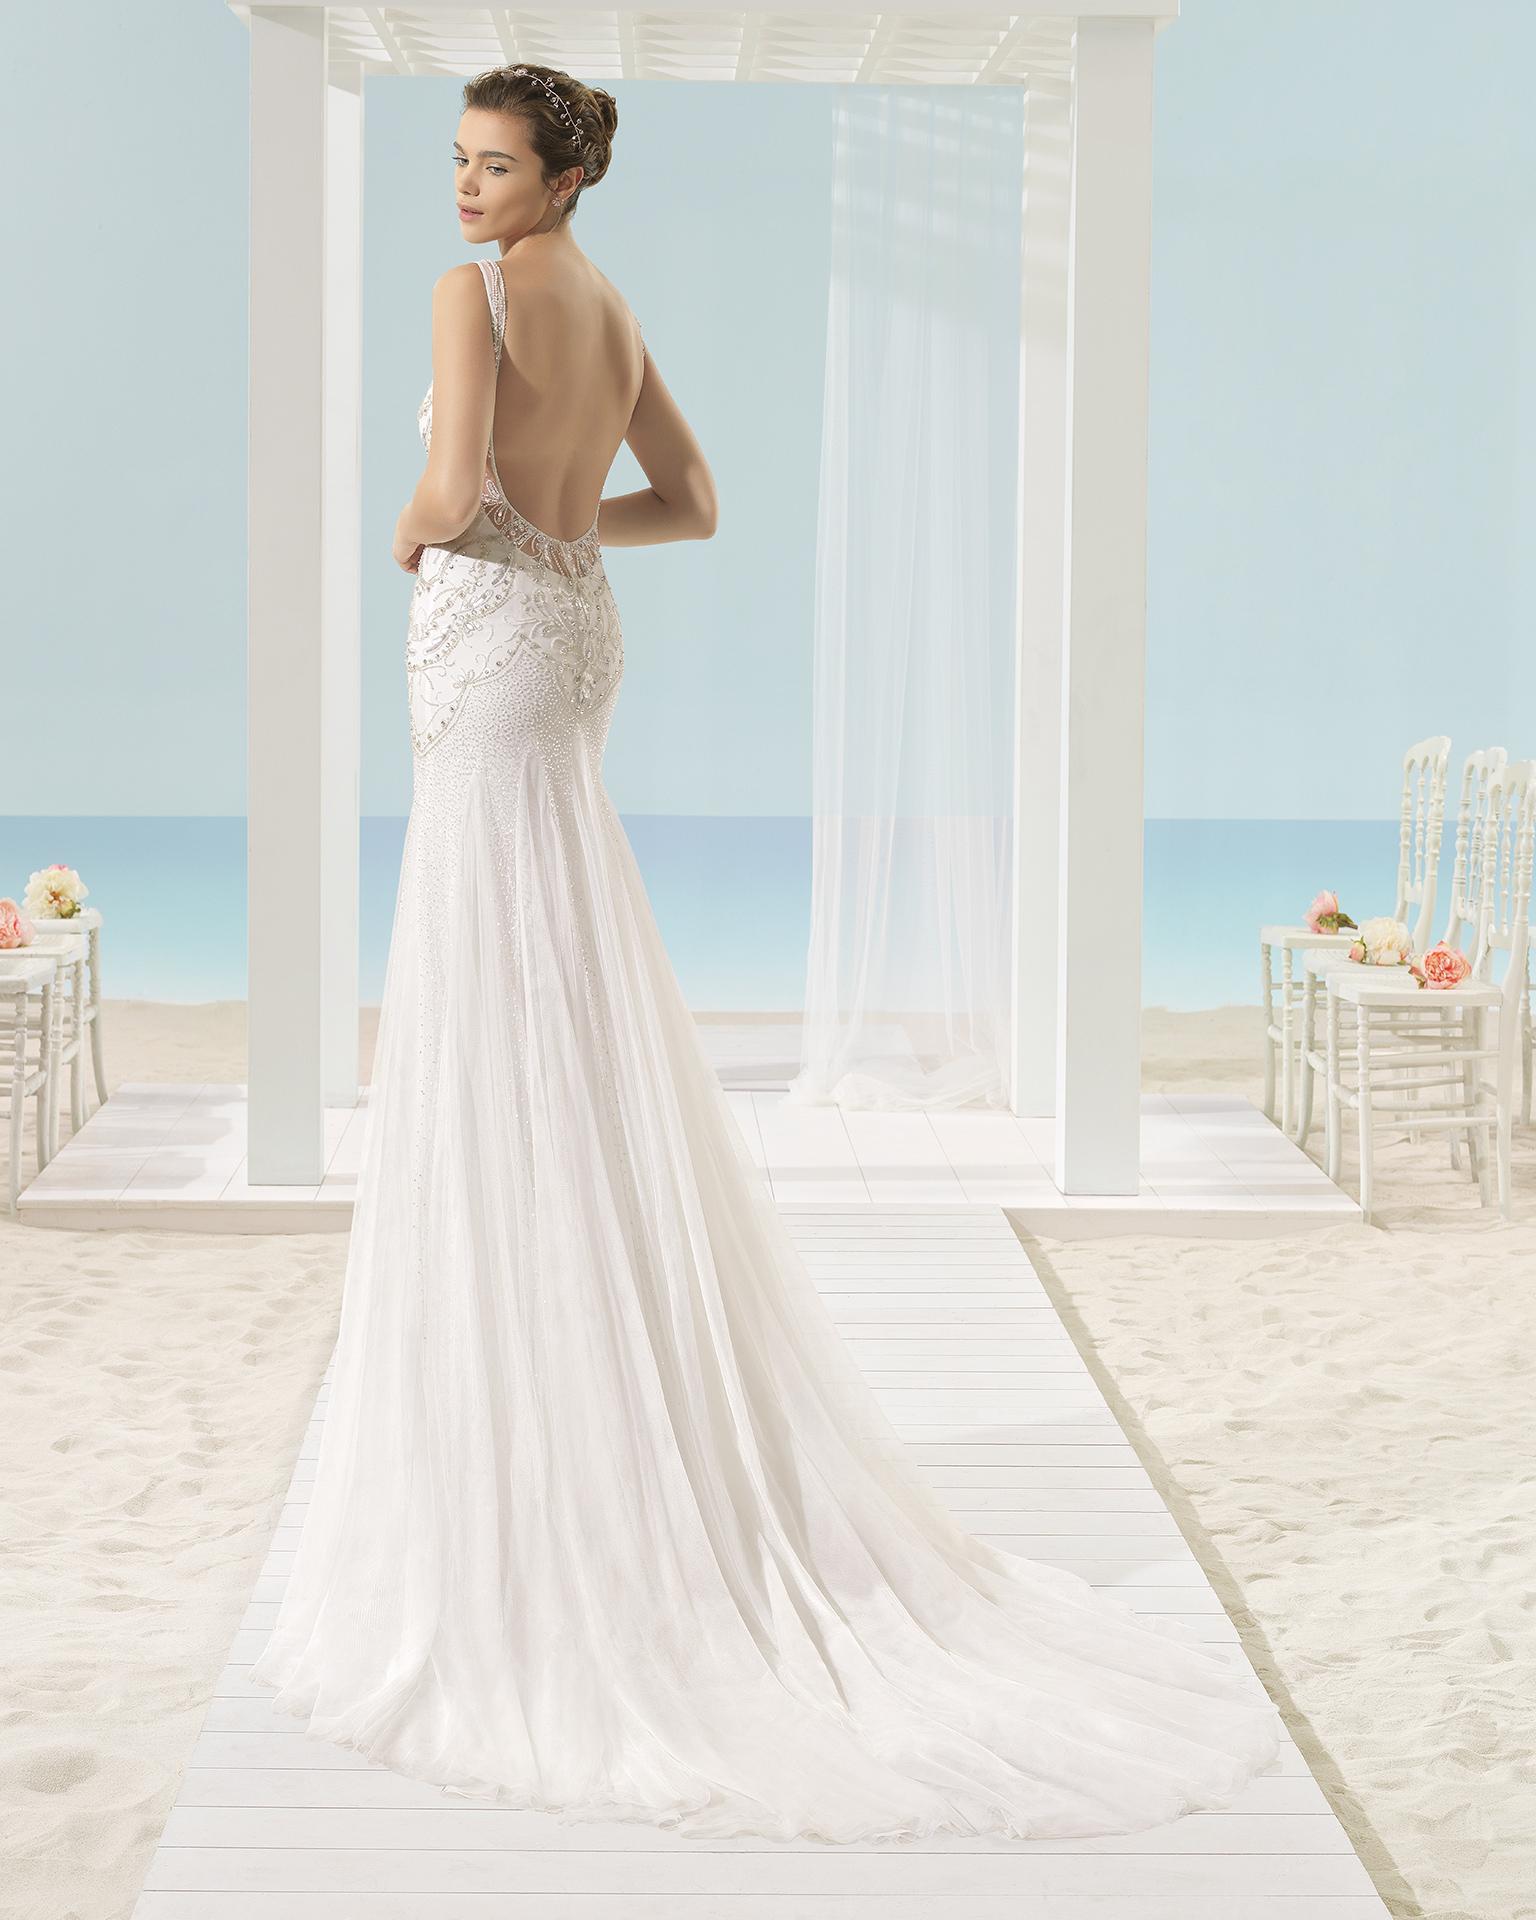 XACOB wedding dress - Aire Barcelona Beach Wedding 2017